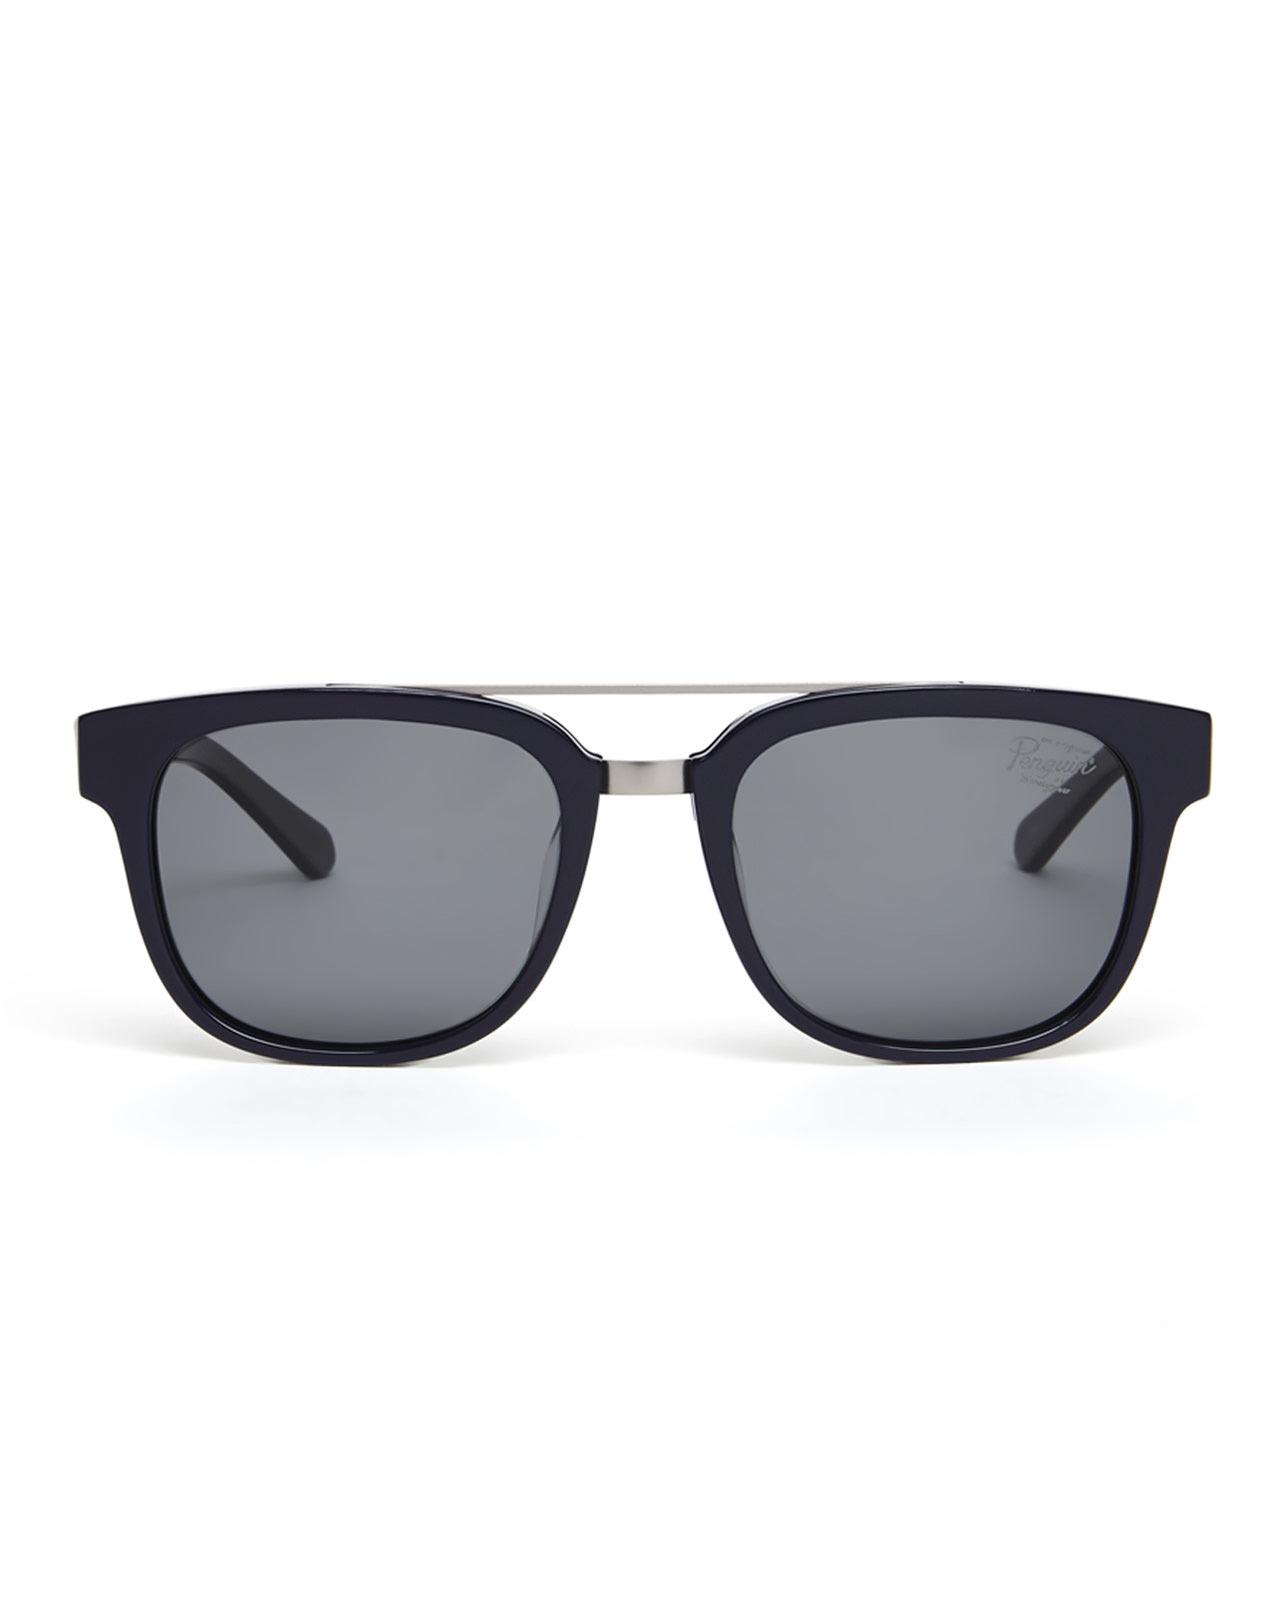 Nvenvy Sunglass  original penguin plum adms nv wayfarer sunglasses in purple for